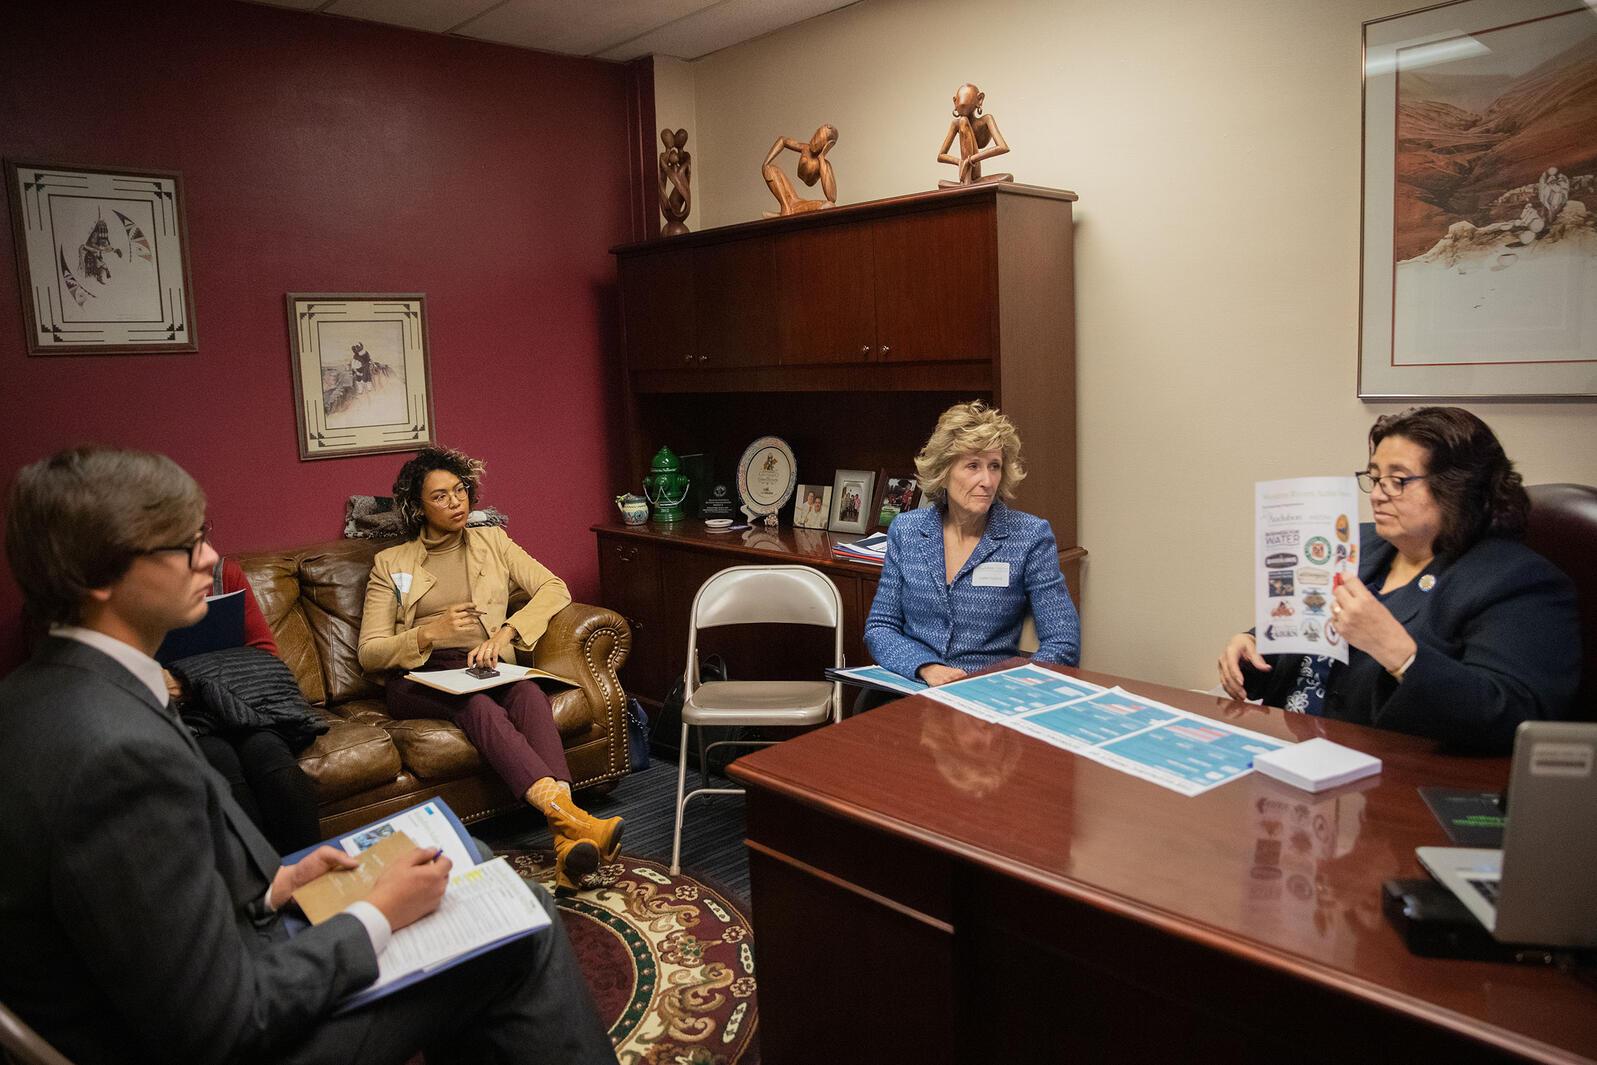 Rep. Rosanna Gabaldón reads over documents during a meeting with members of Audubon Arizona. Dominic Arenas/Audubon